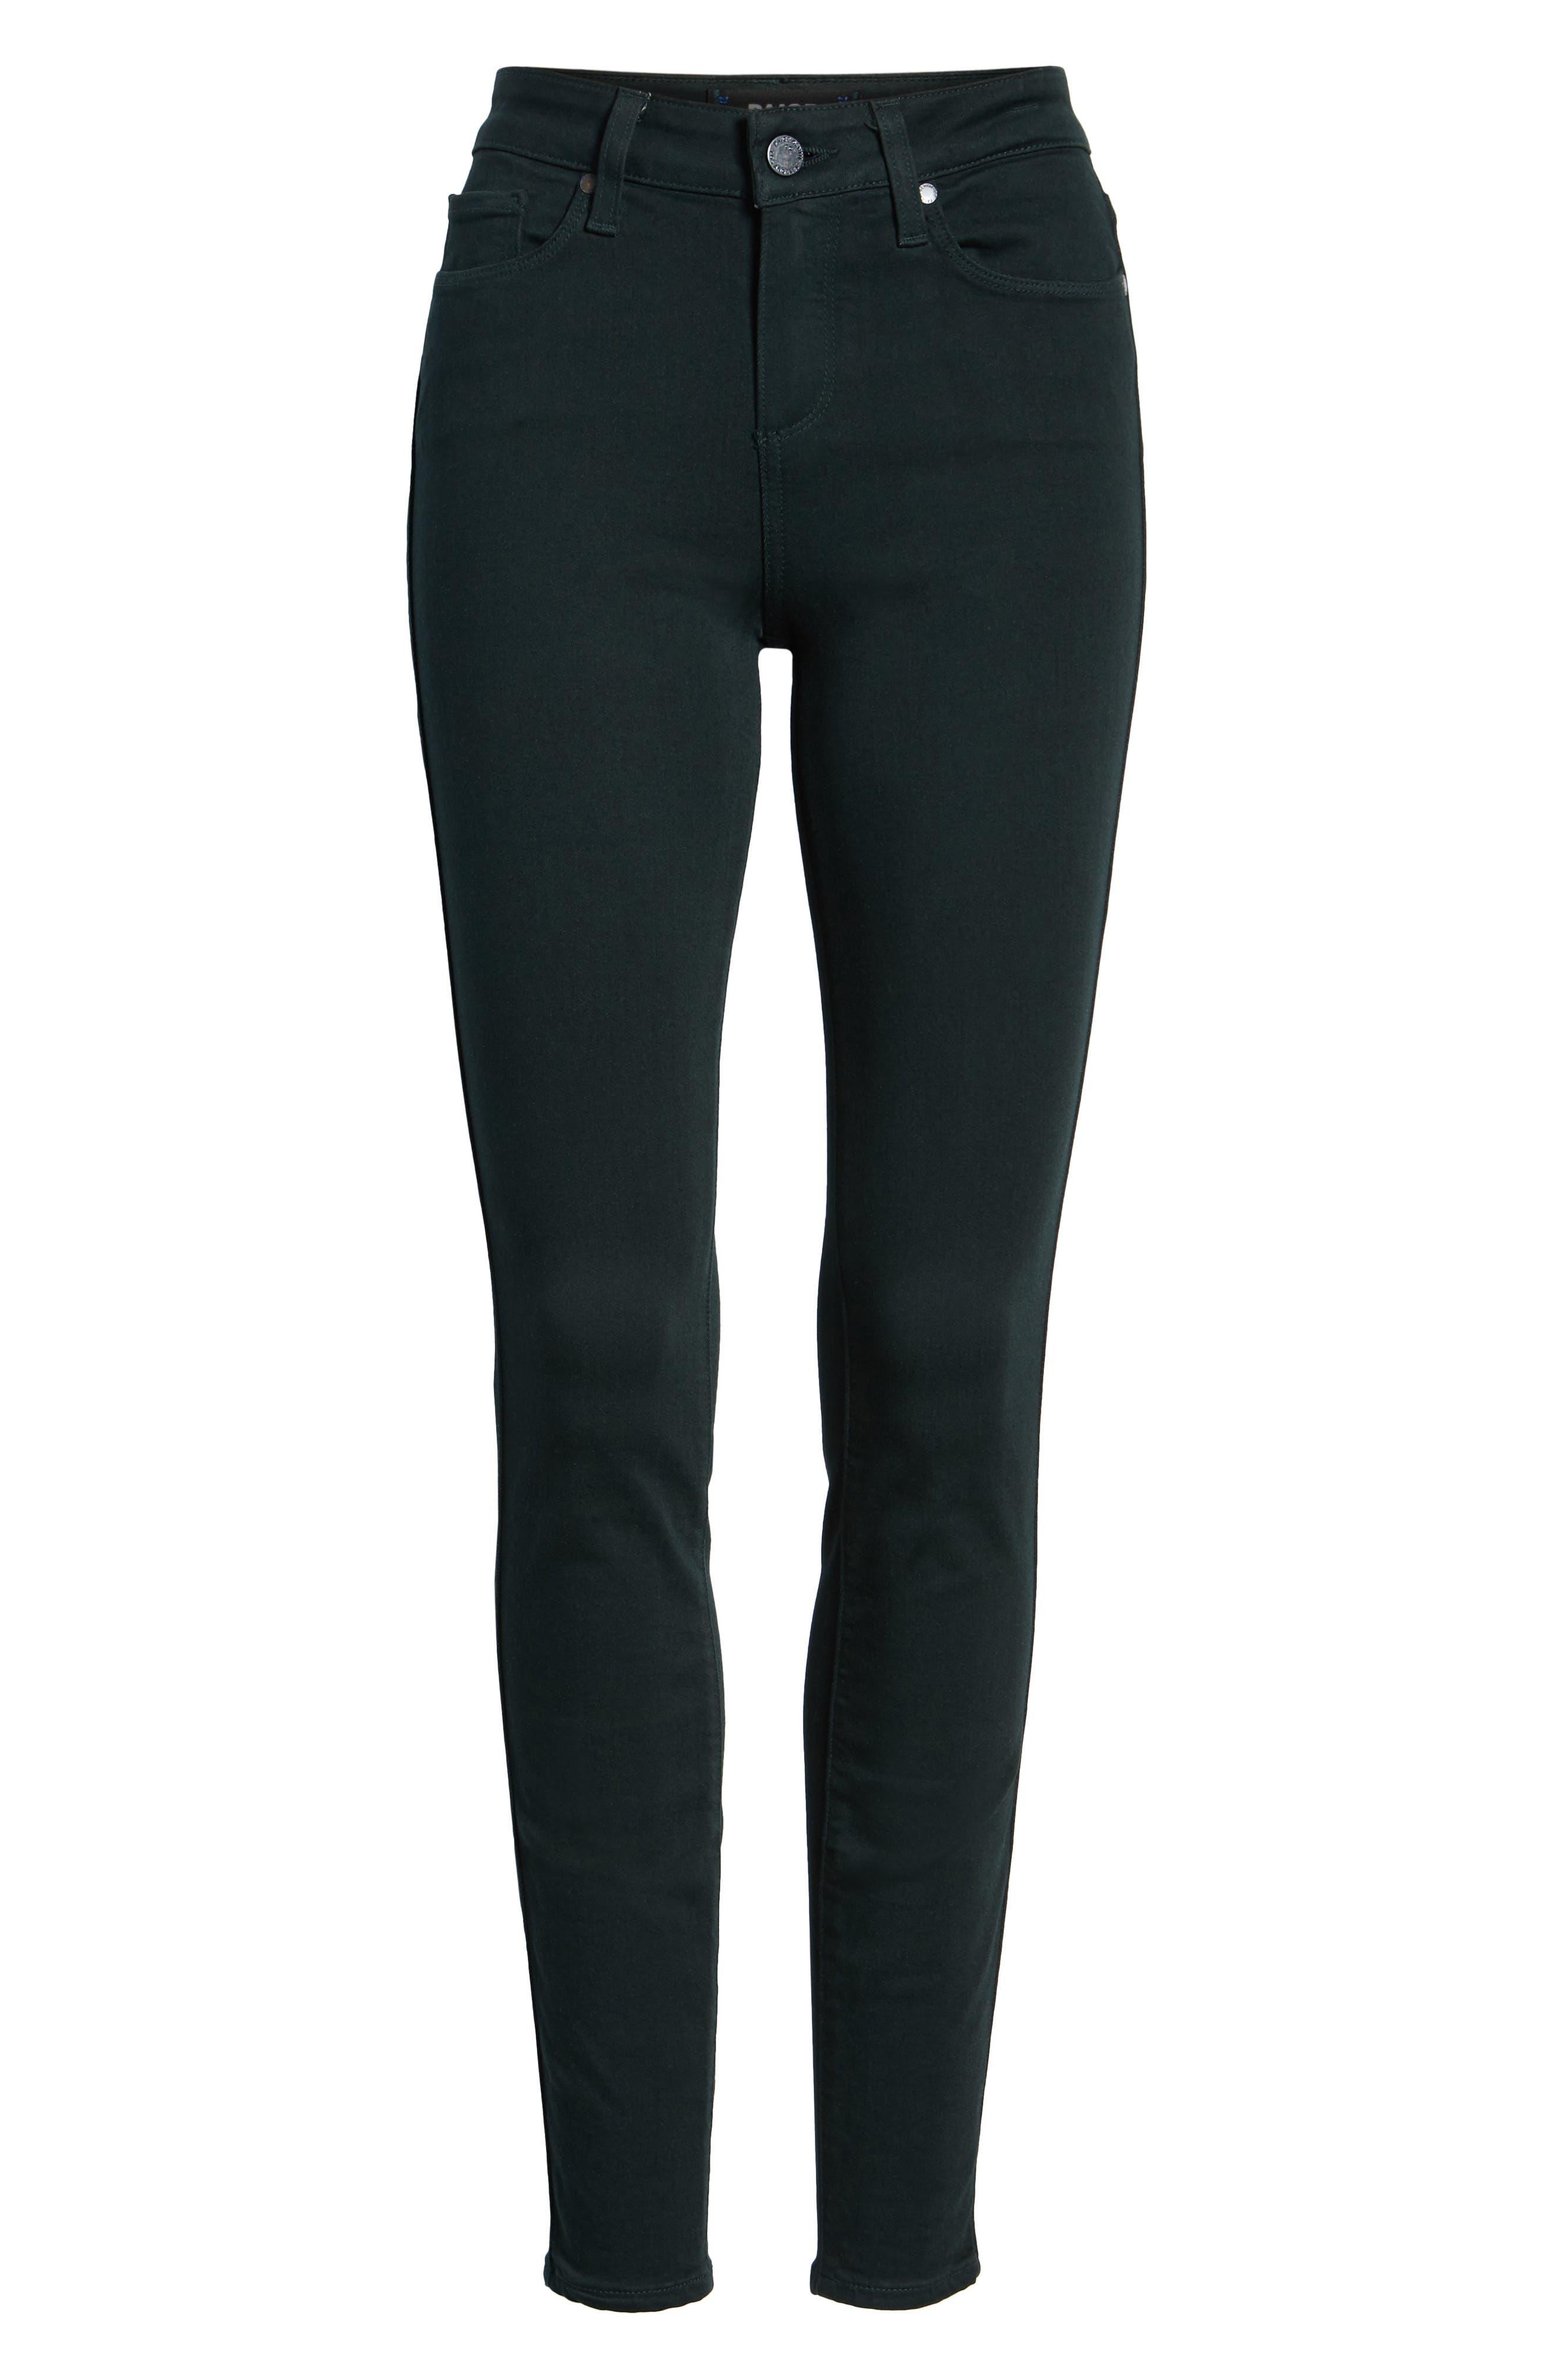 Transcend - Verdugo Ultra Skinny Jeans,                             Alternate thumbnail 7, color,                             MIDNIGHT GREEN